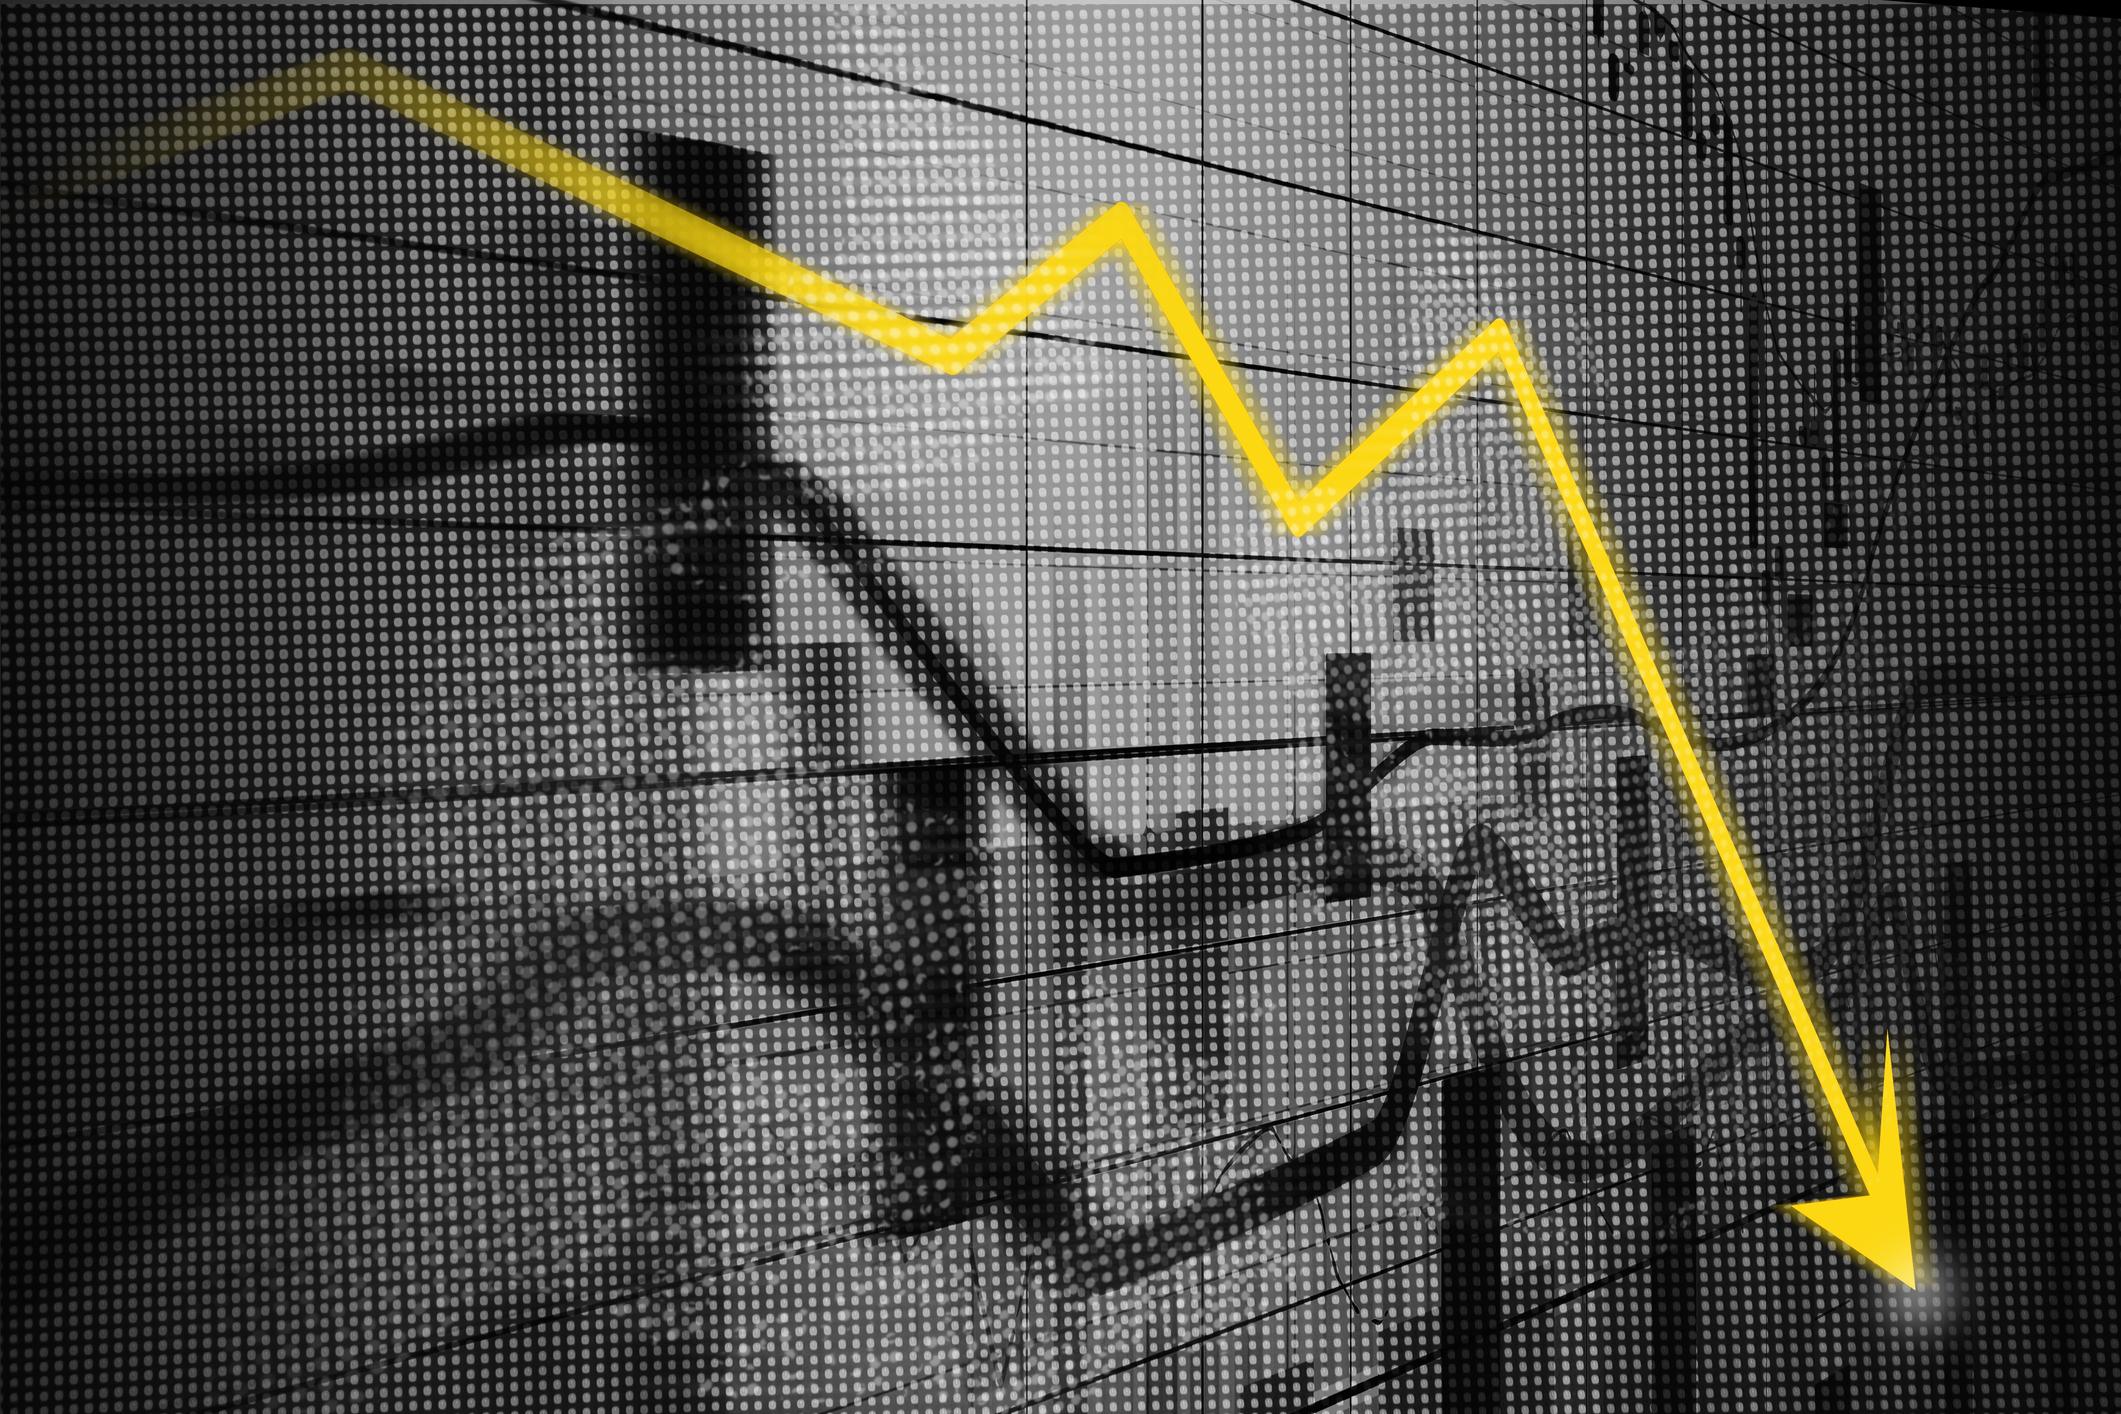 Yellow stock market arrow chart indicating losses